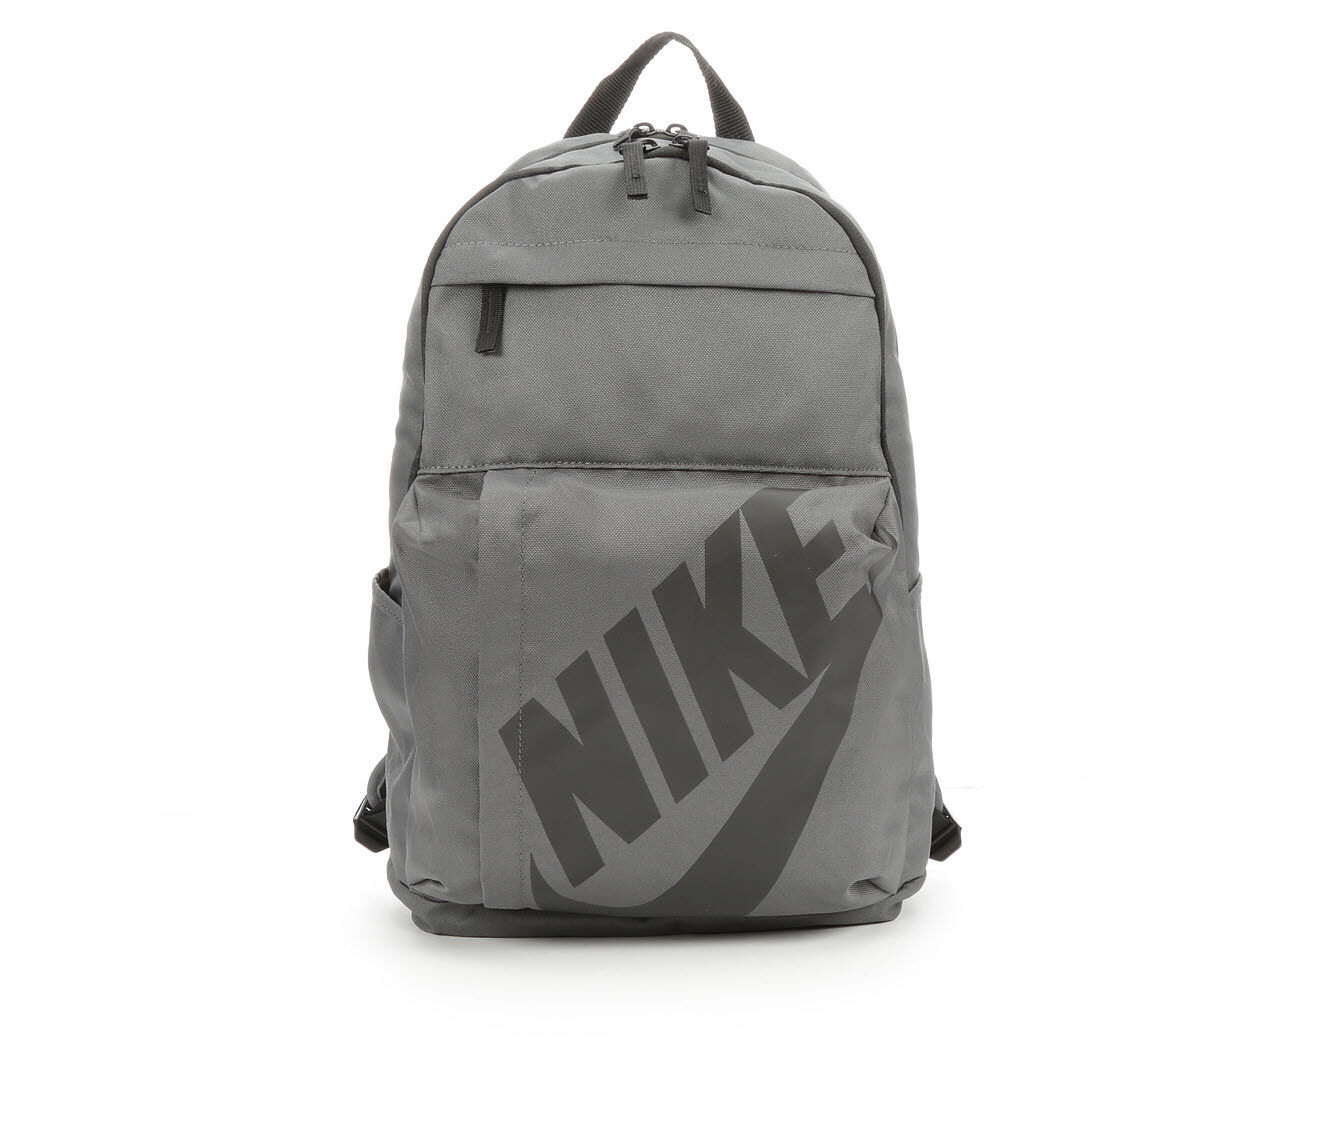 cheap fila backpack mens